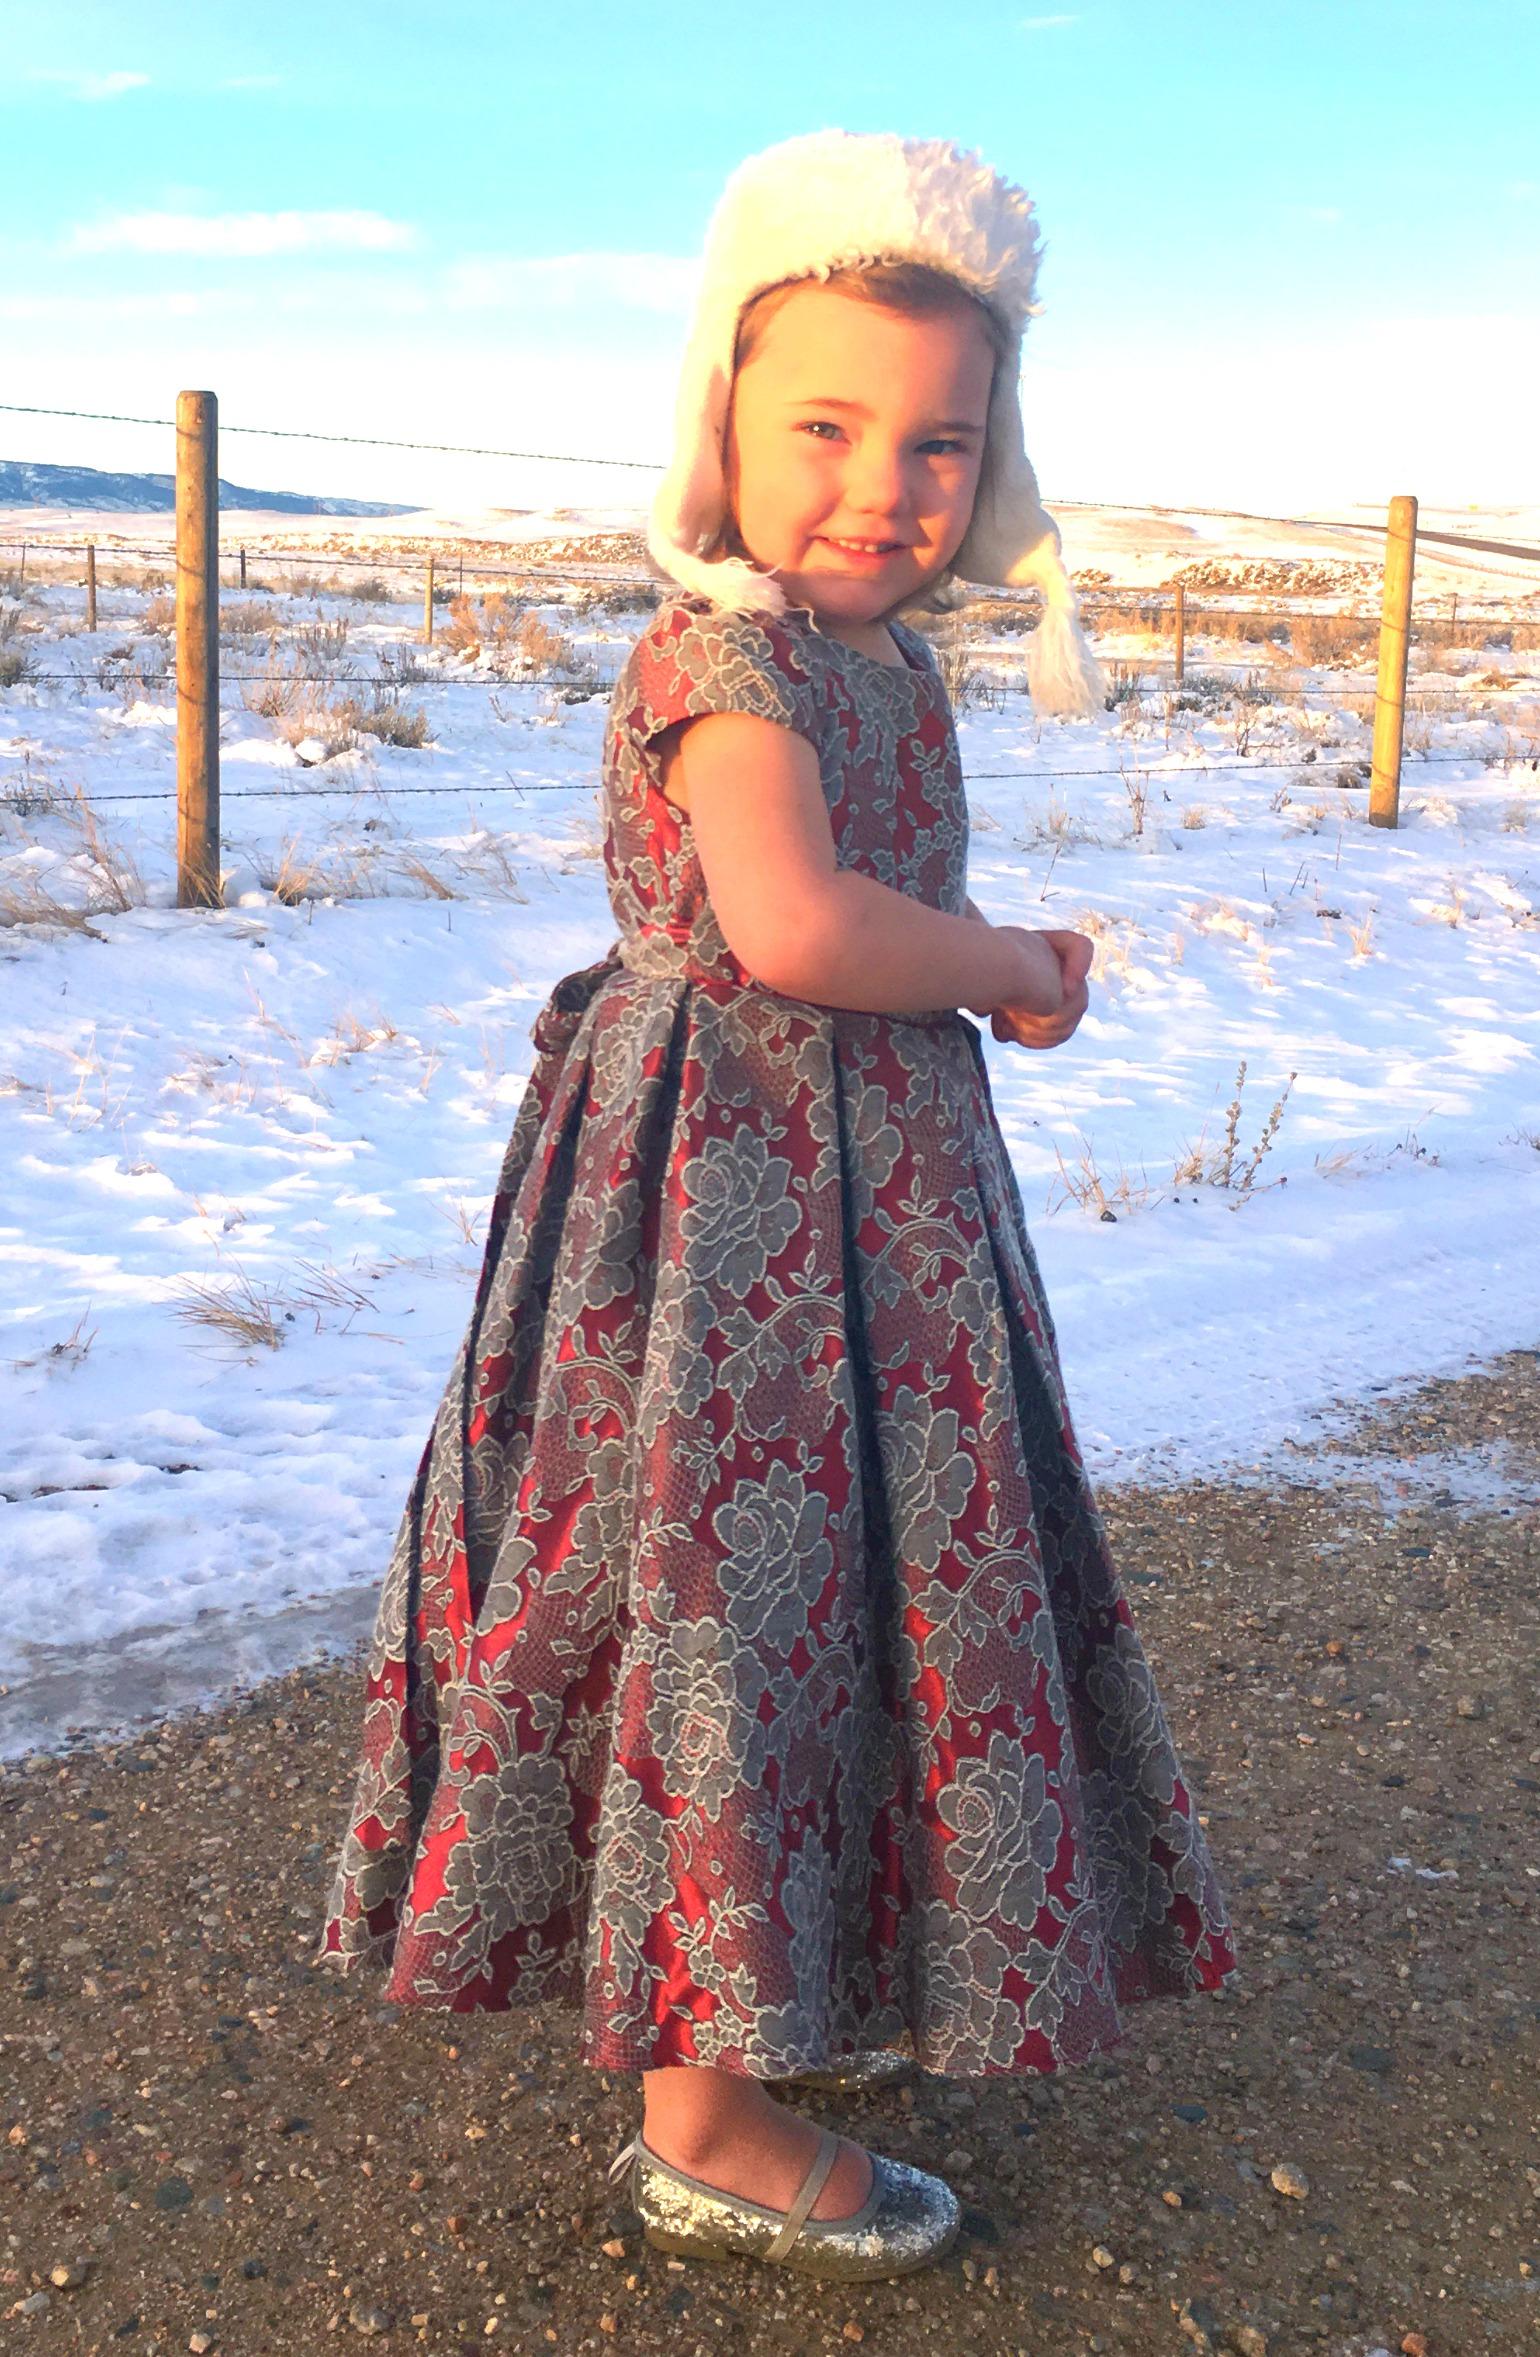 439fe6beb179 Holiday Fashion for Kids #giveaway - PrairieWifeinHeels.com